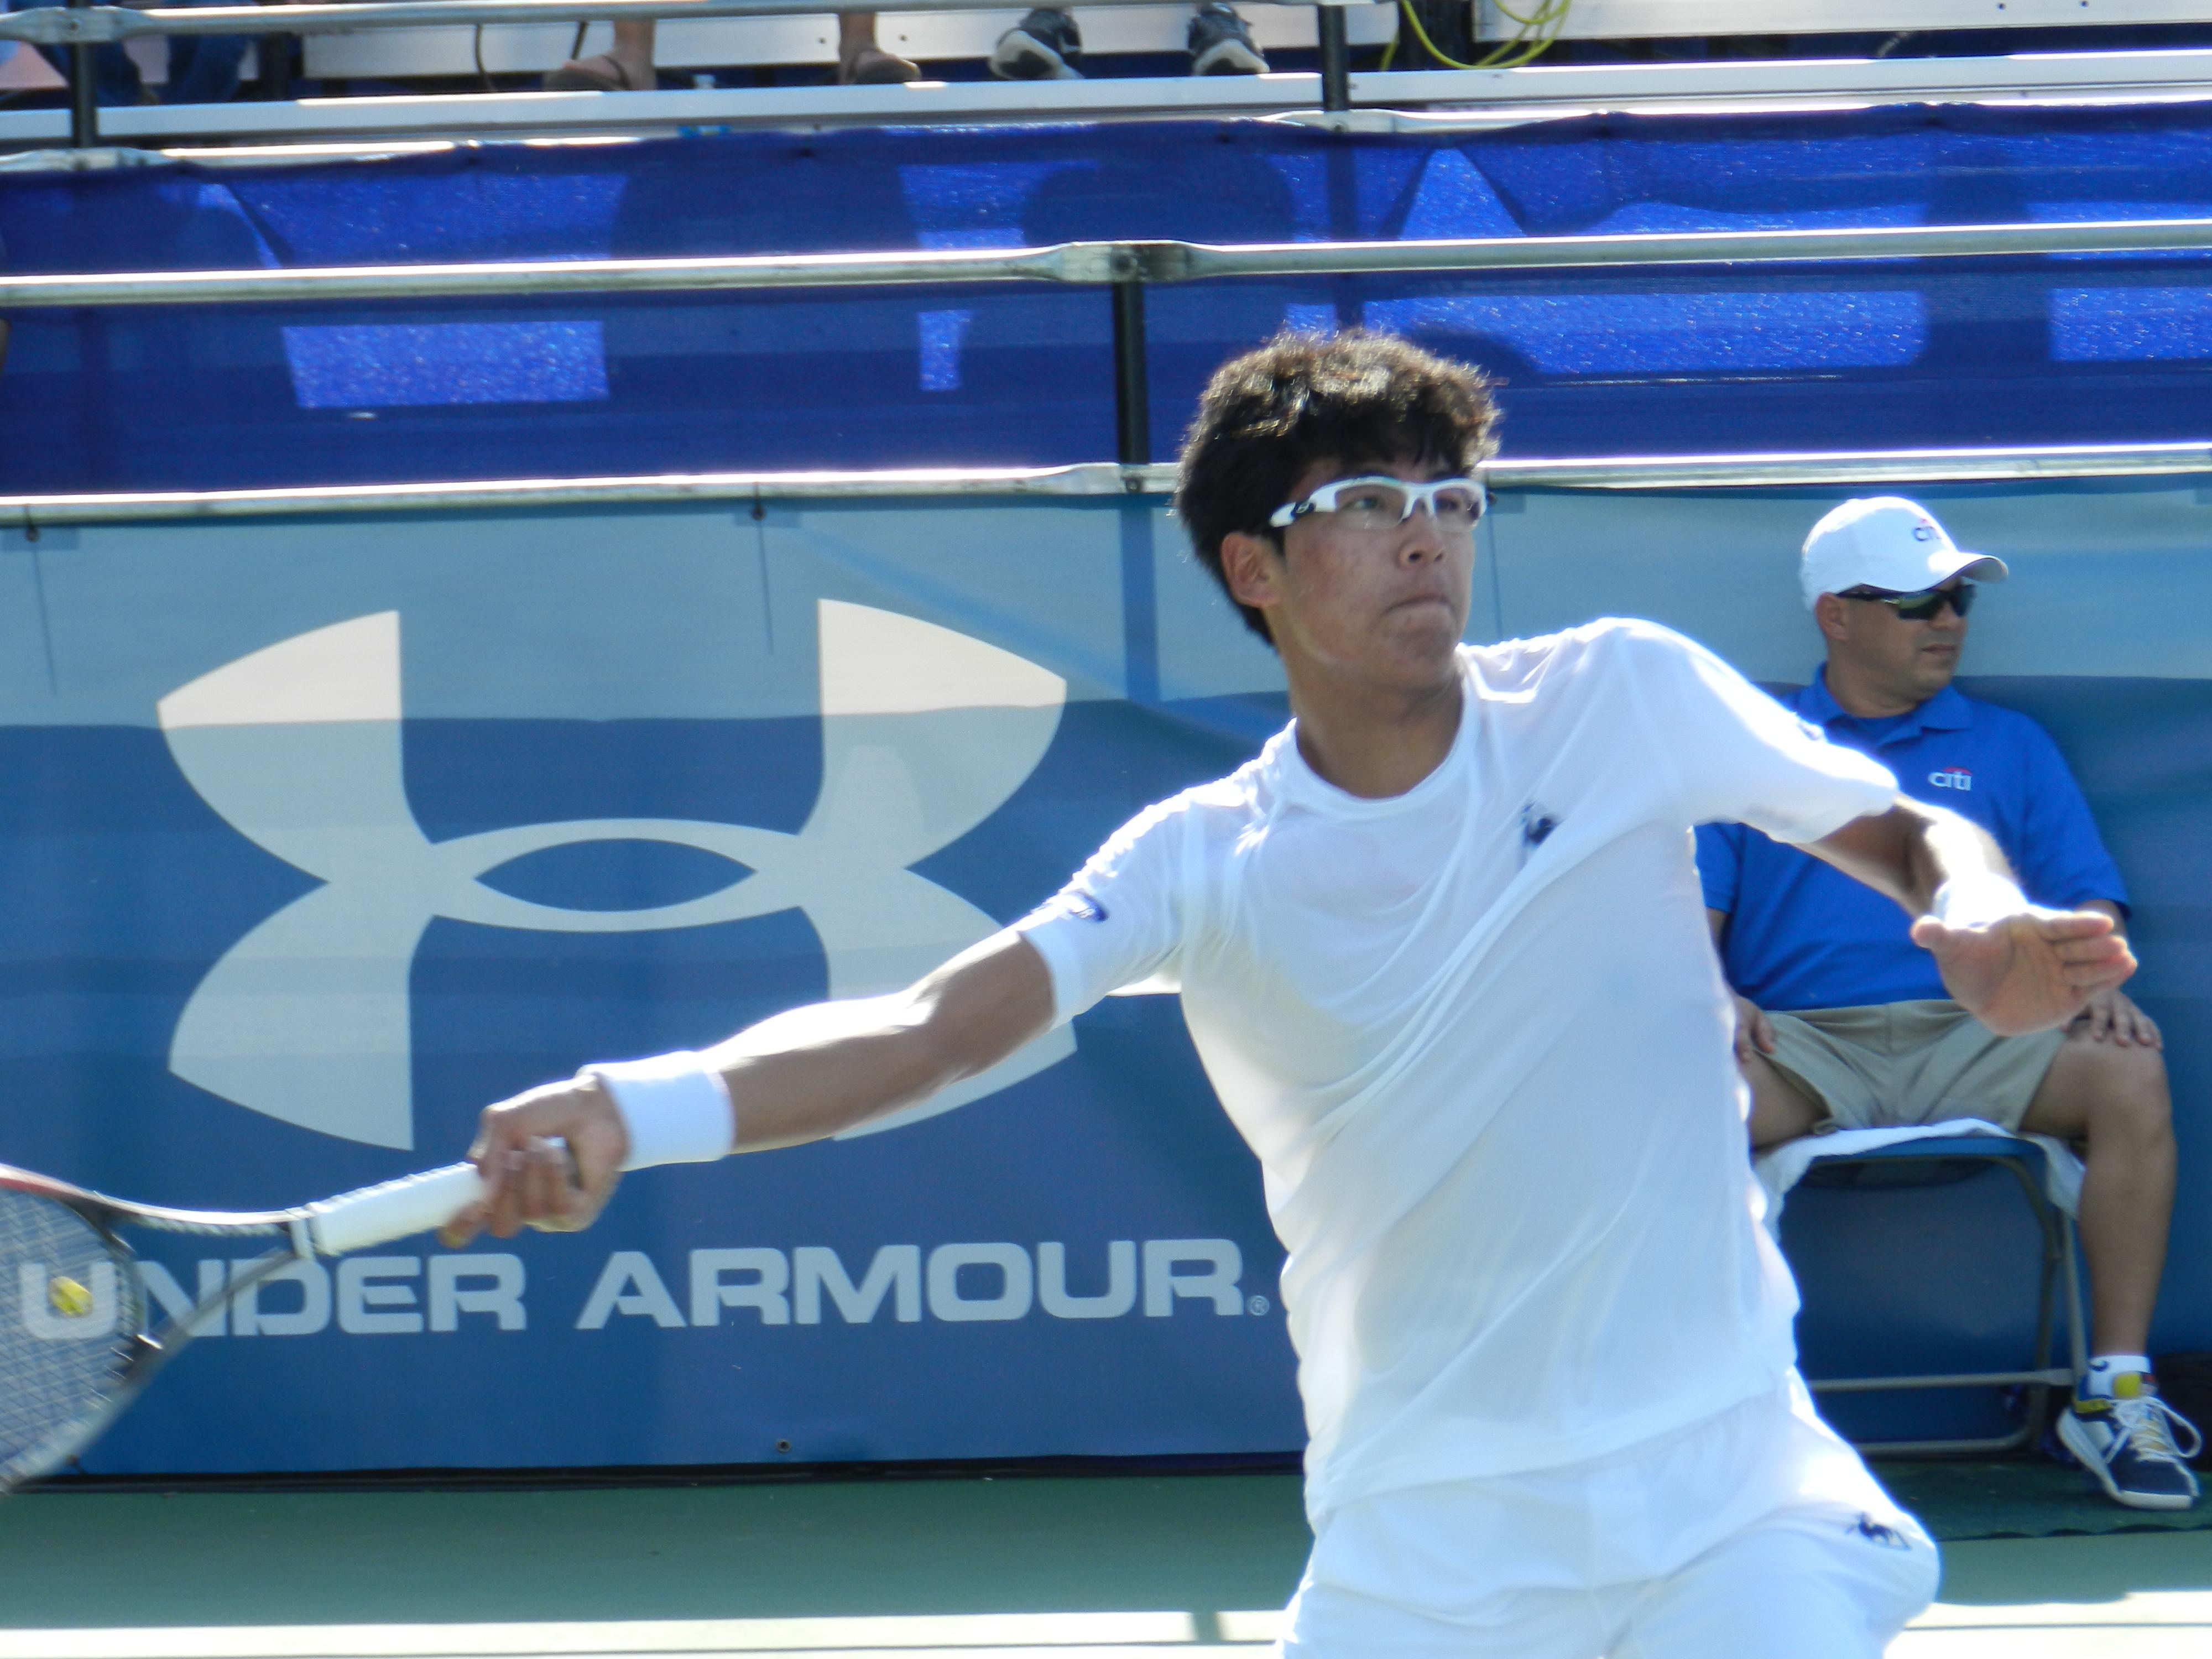 Hyeon Chung (Photo: TennisAtlantic.com)